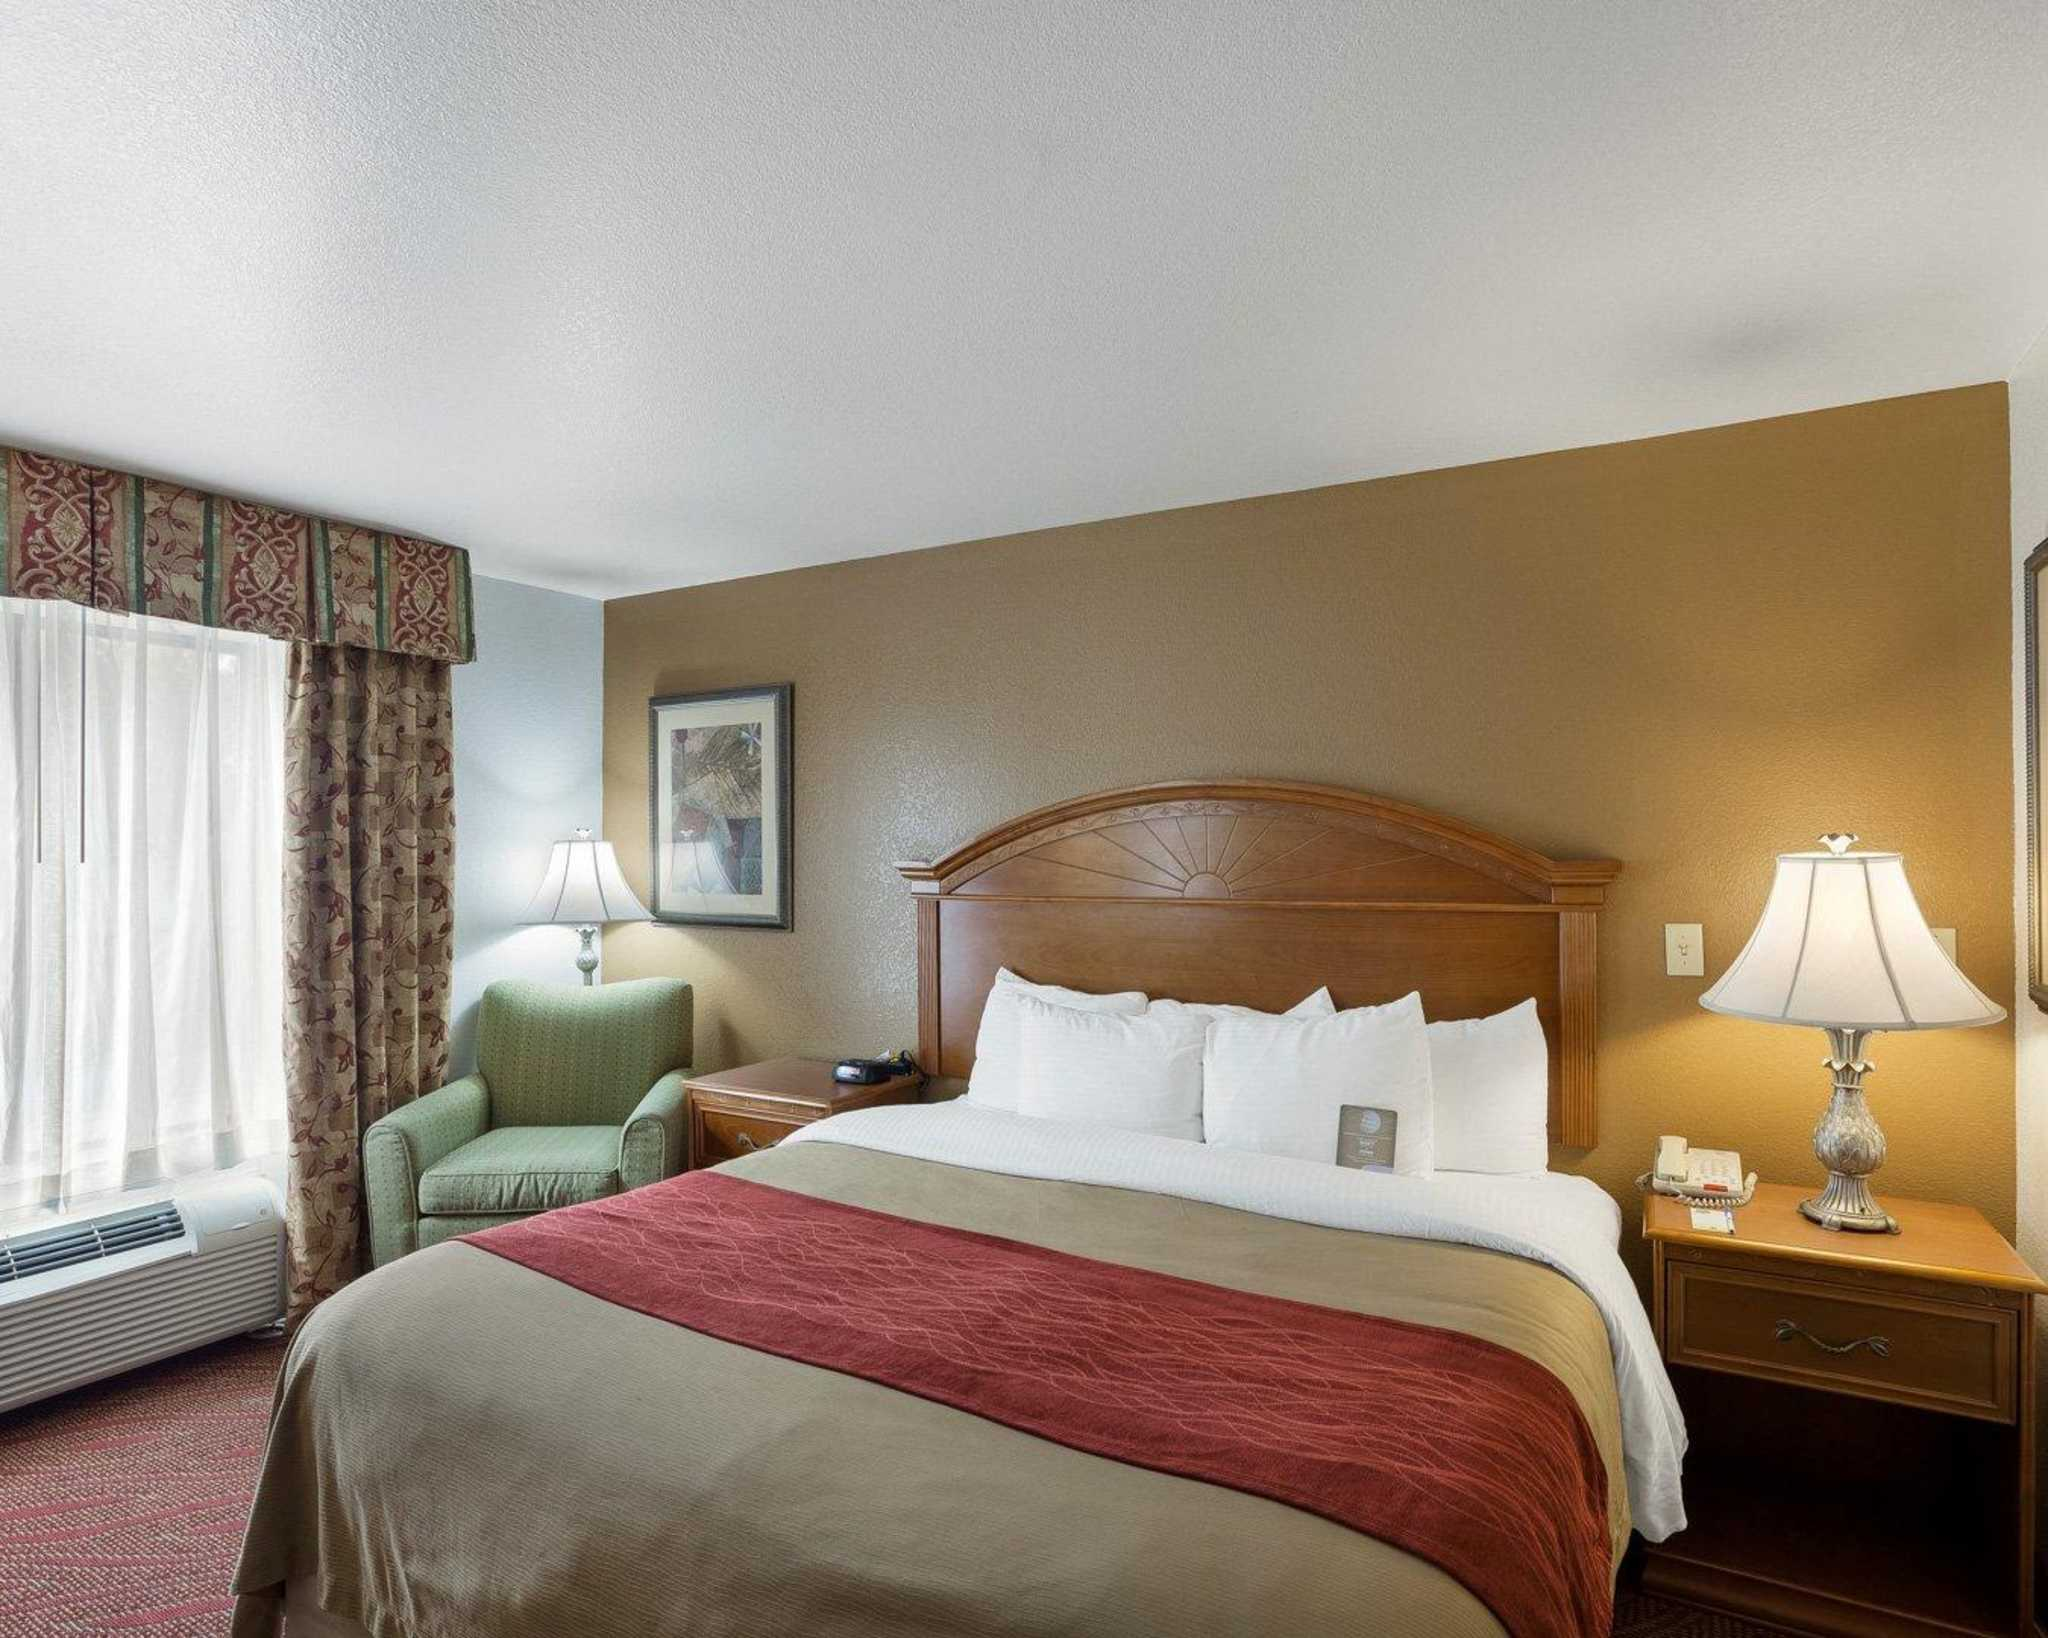 Comfort Inn & Suites Near Medical Center image 23